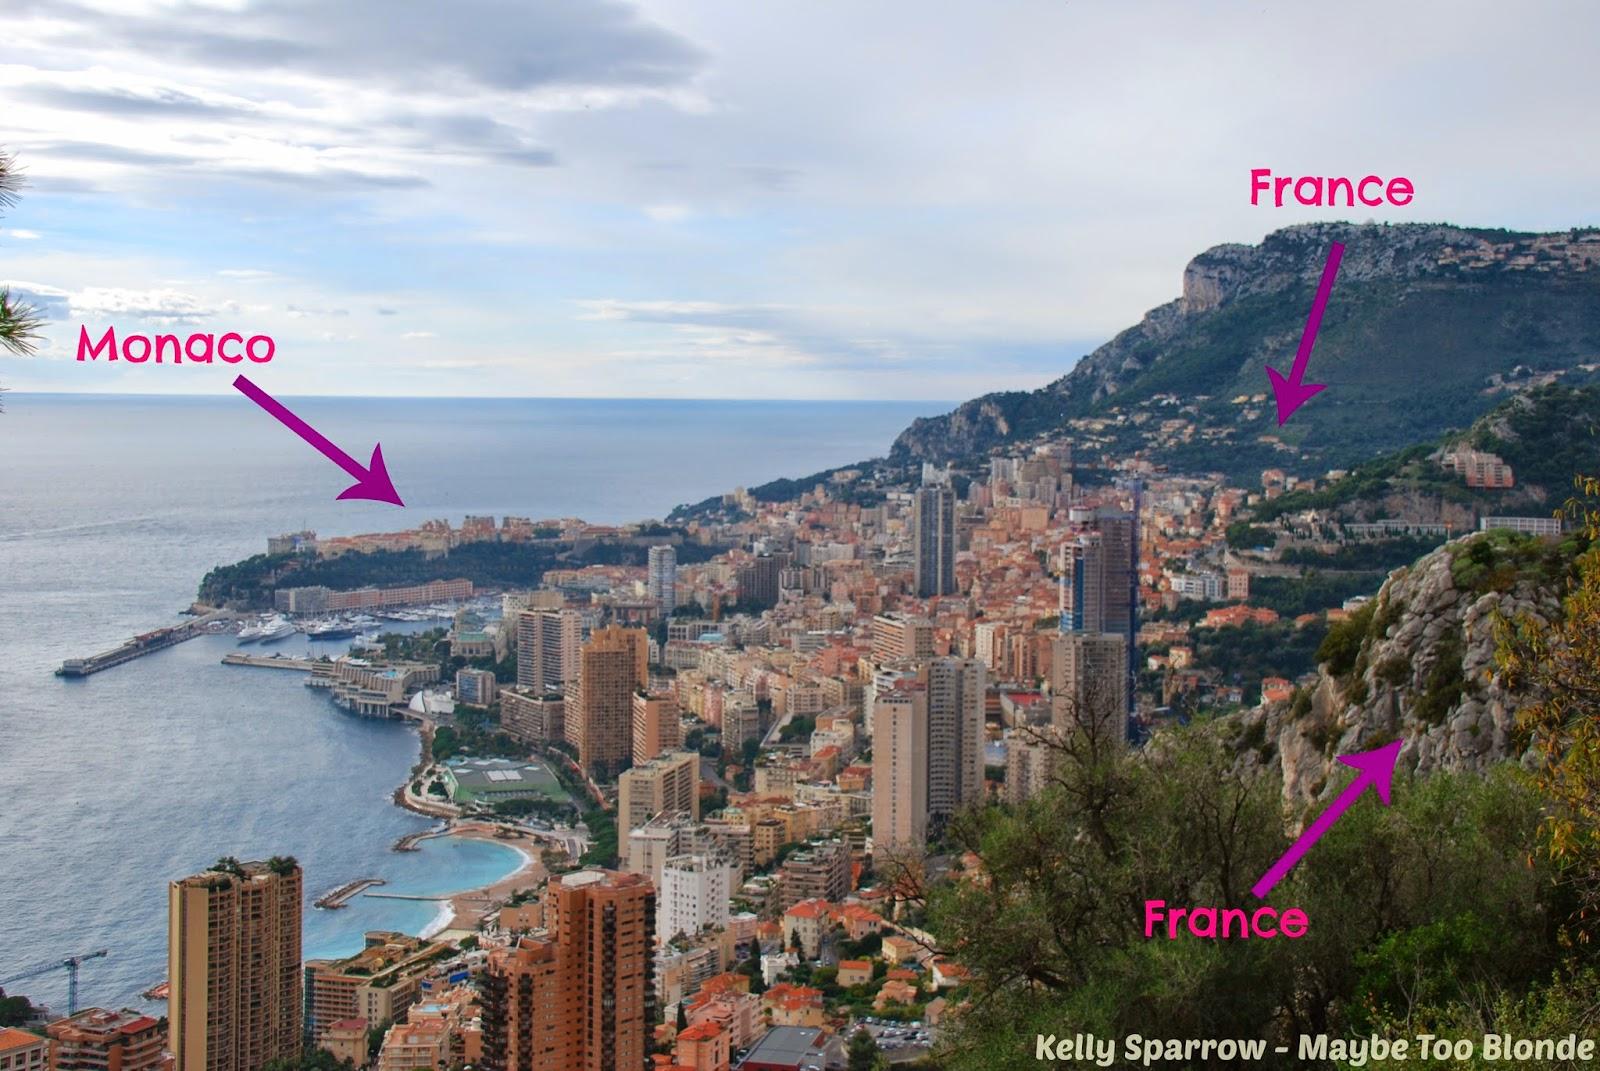 Monaco France border